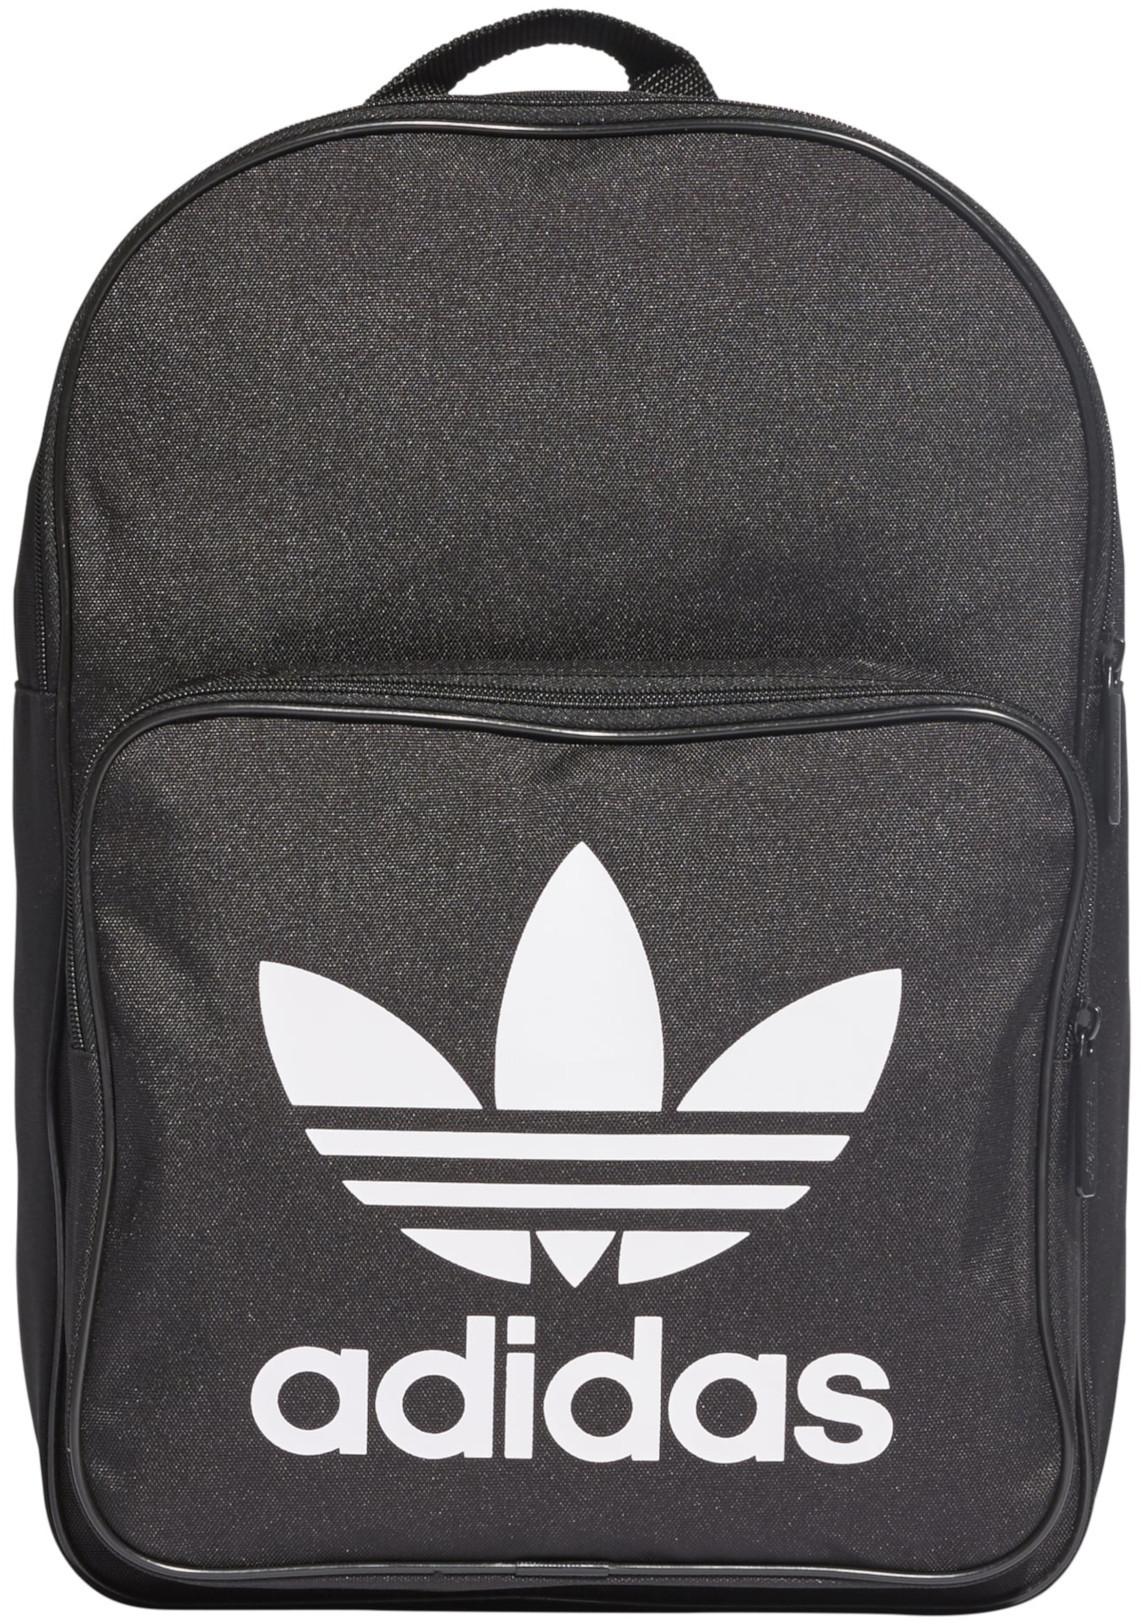 Adidas Plecak Classic Trefoil DW5185